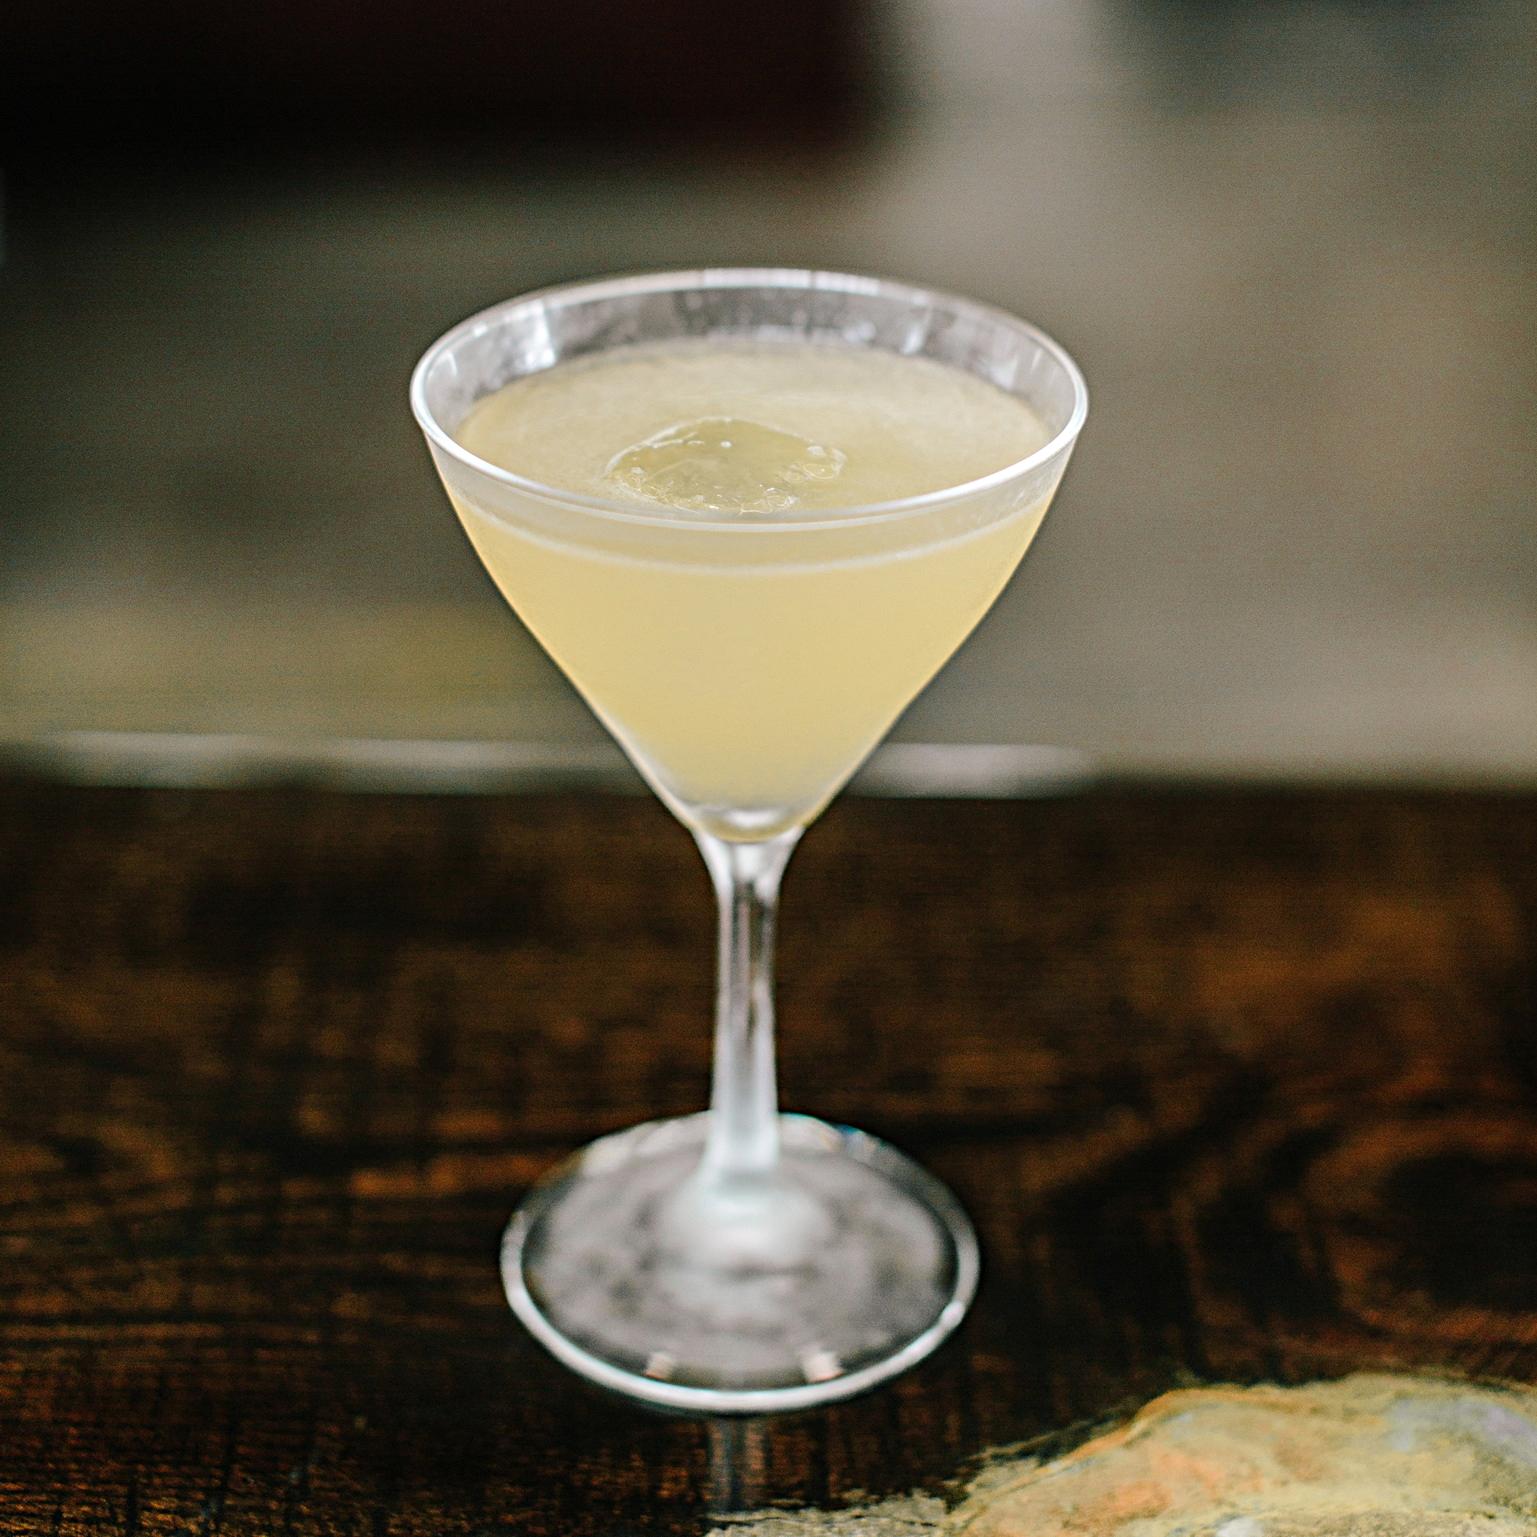 The Daisy Cocktail